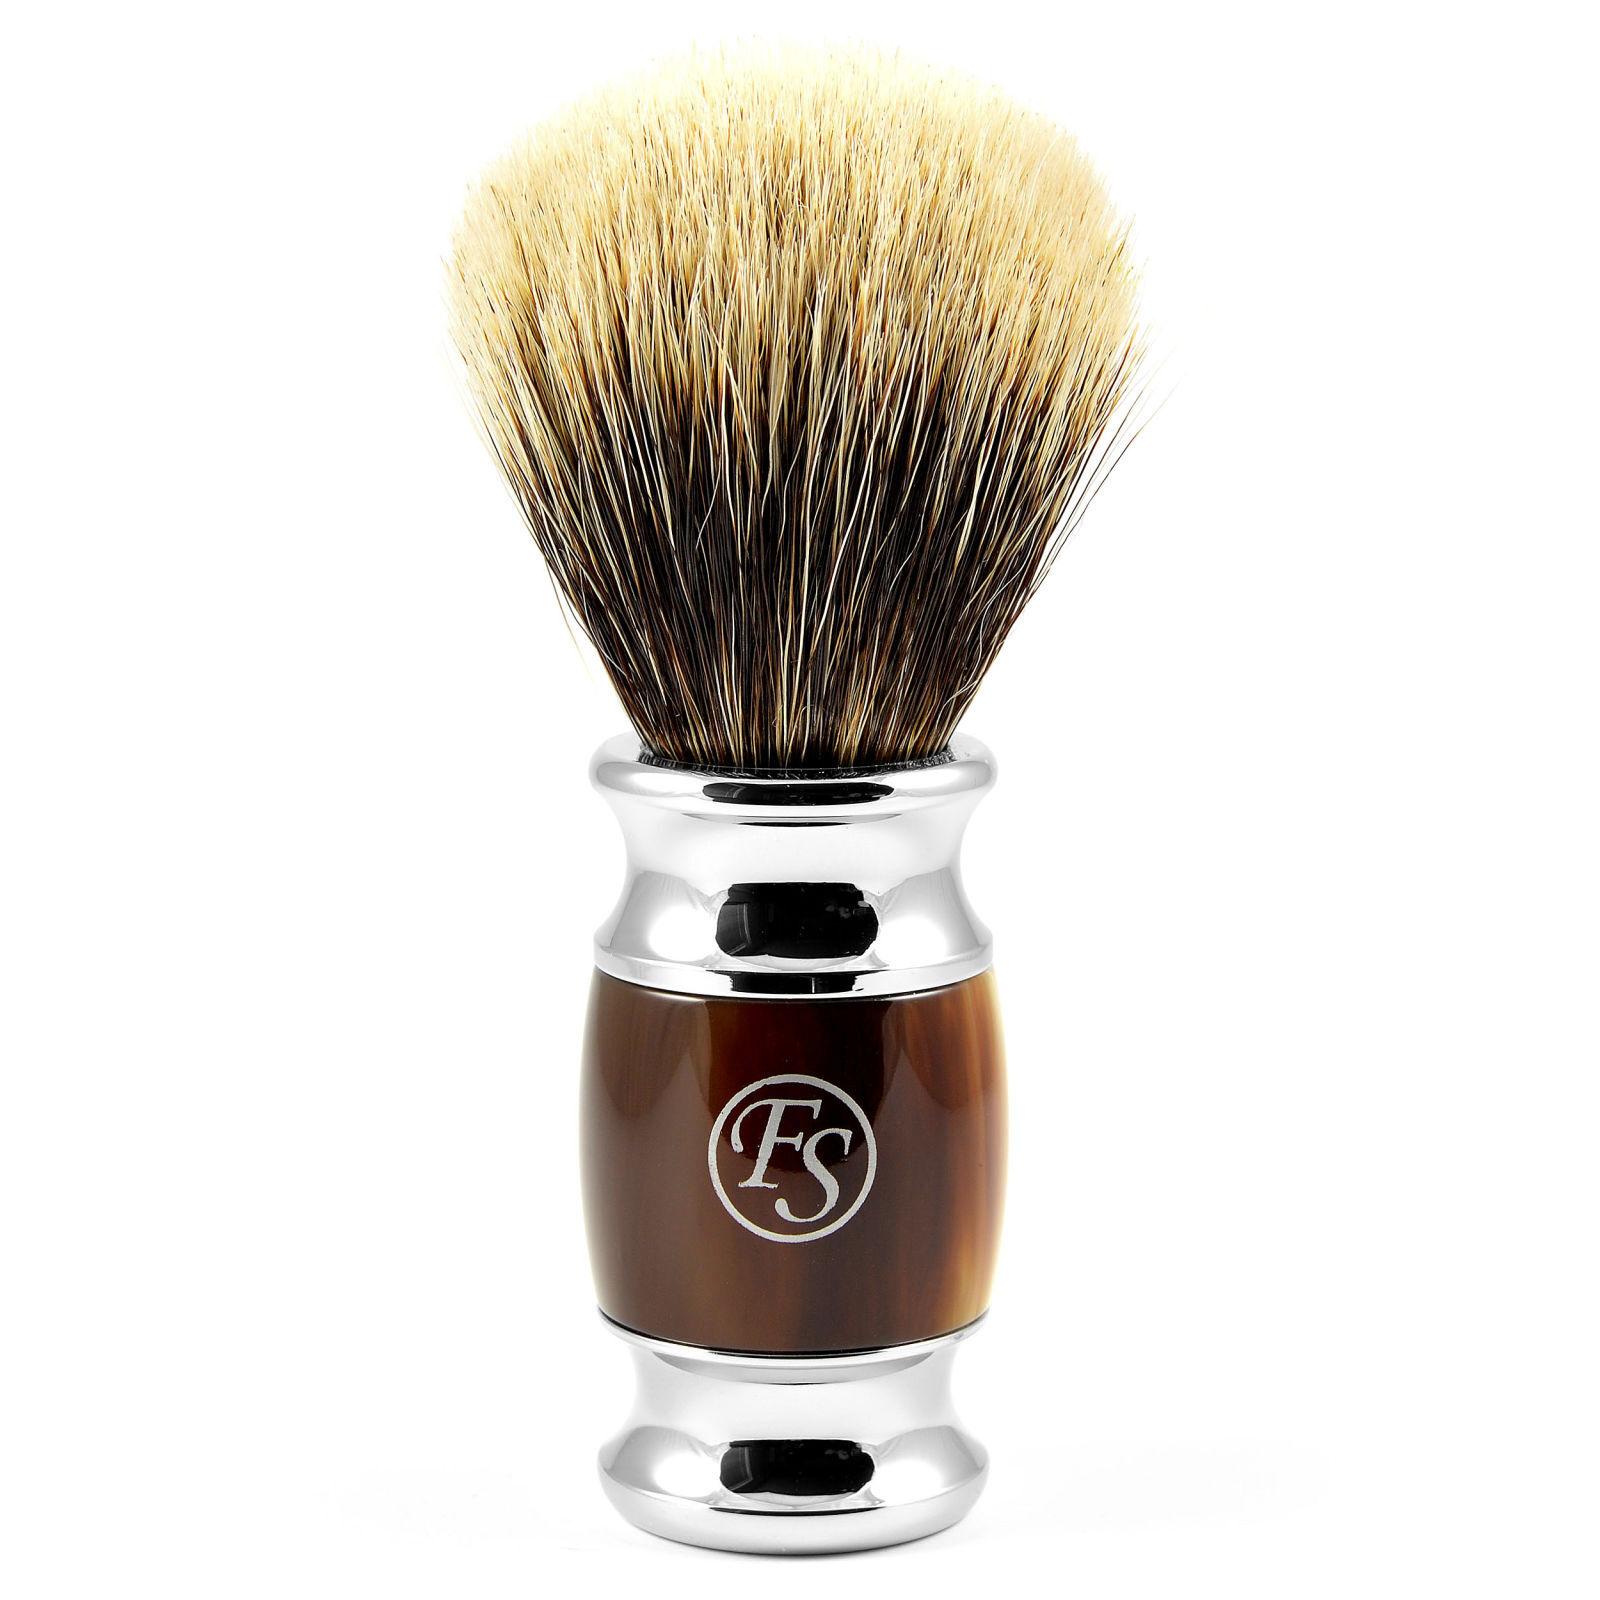 Frank Shaving Sarvikuvioinen Modena Silvertip Mäyränkarva Partasuti